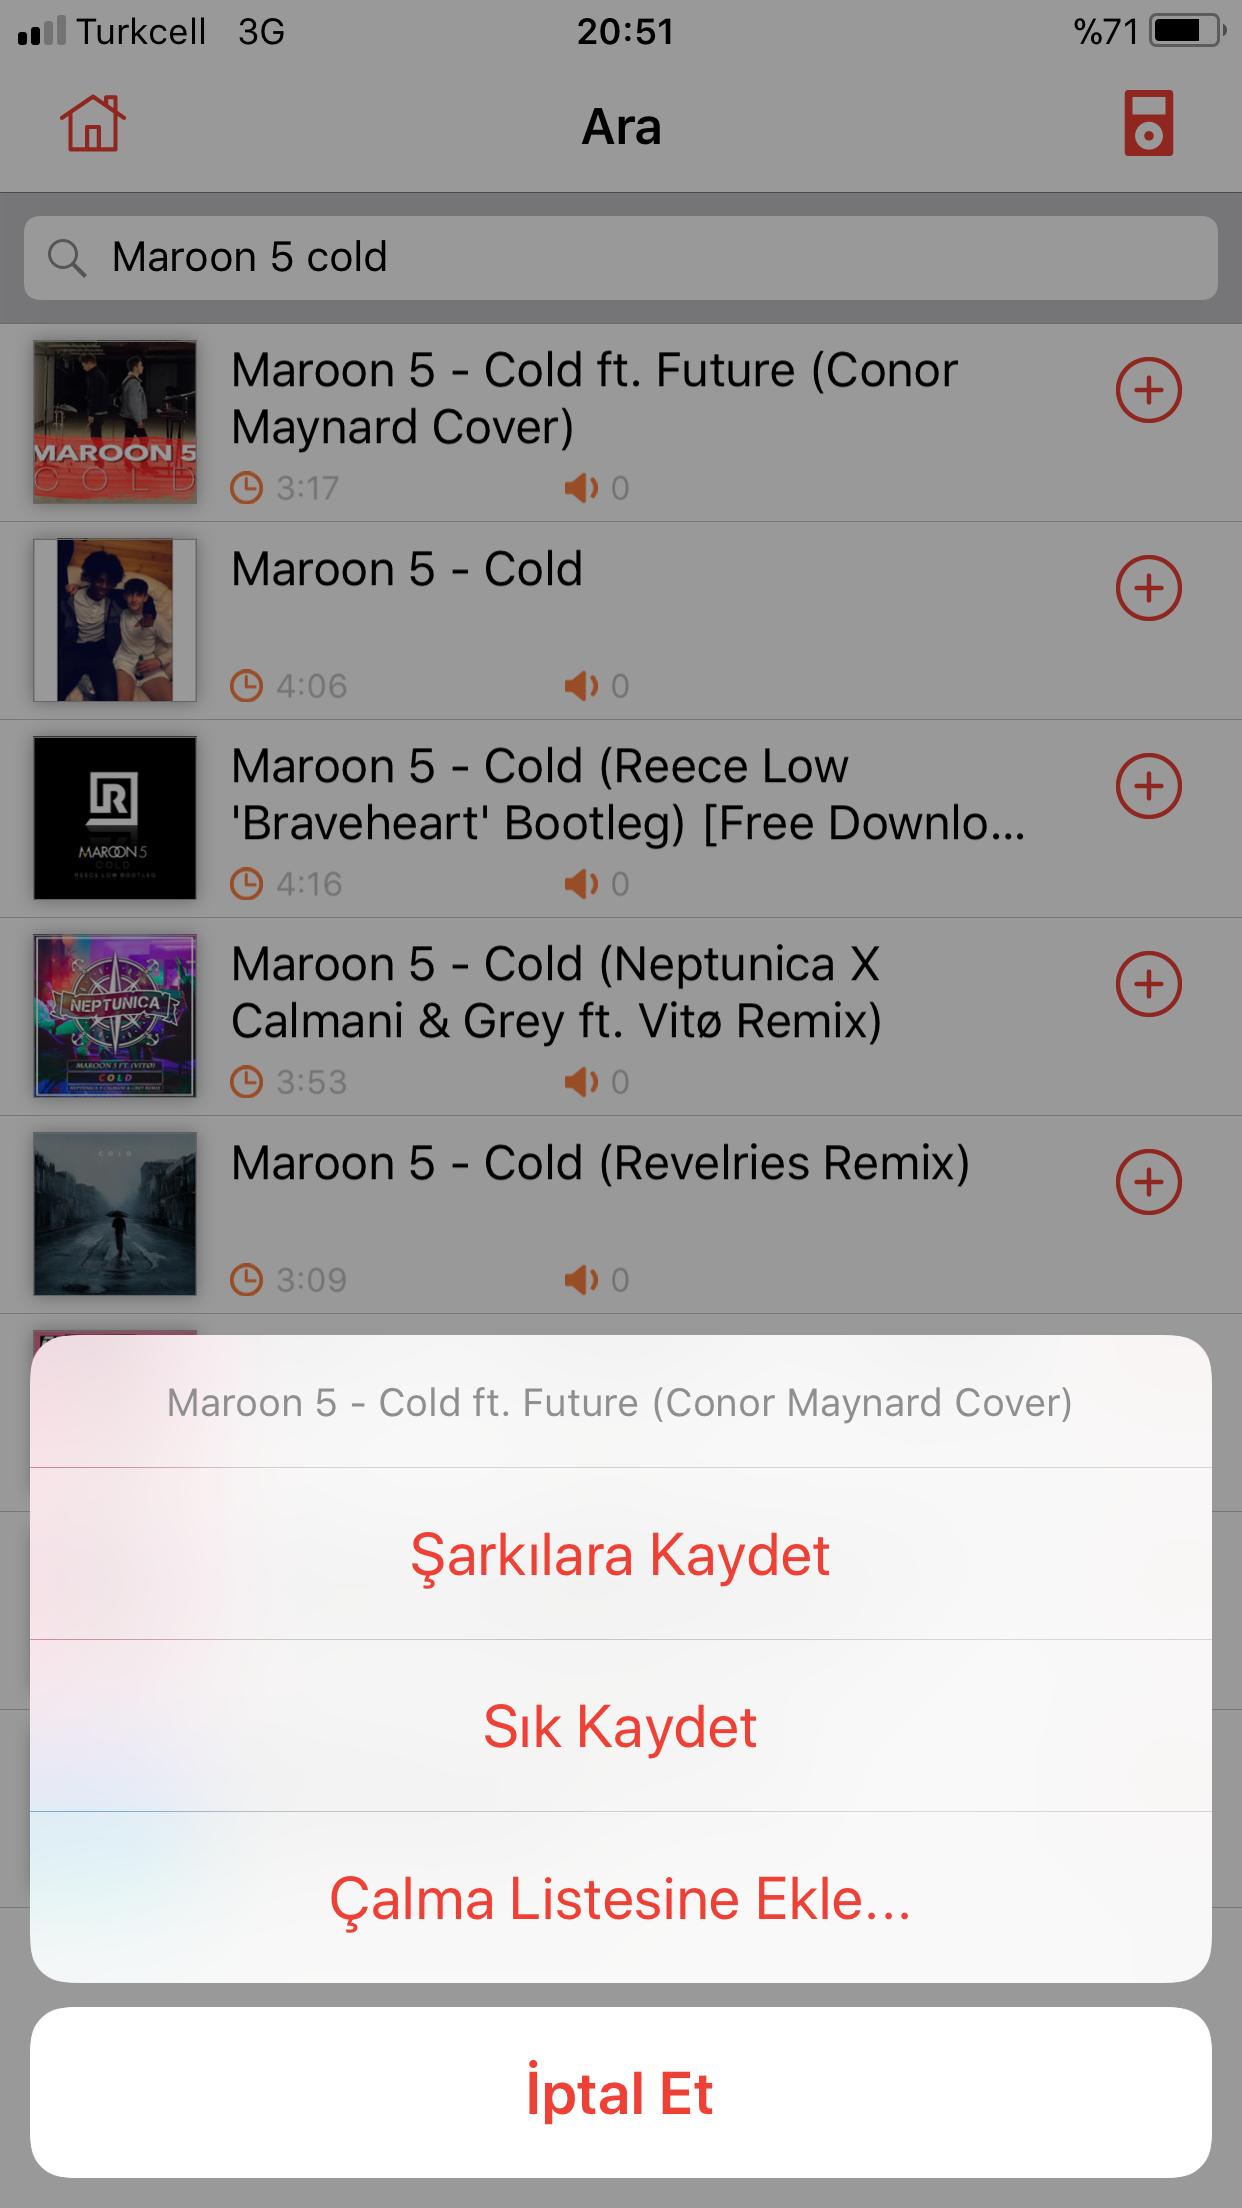 Efsane Konu Iphone Ucretsiz Muzik Indirmek Cevrimdisi